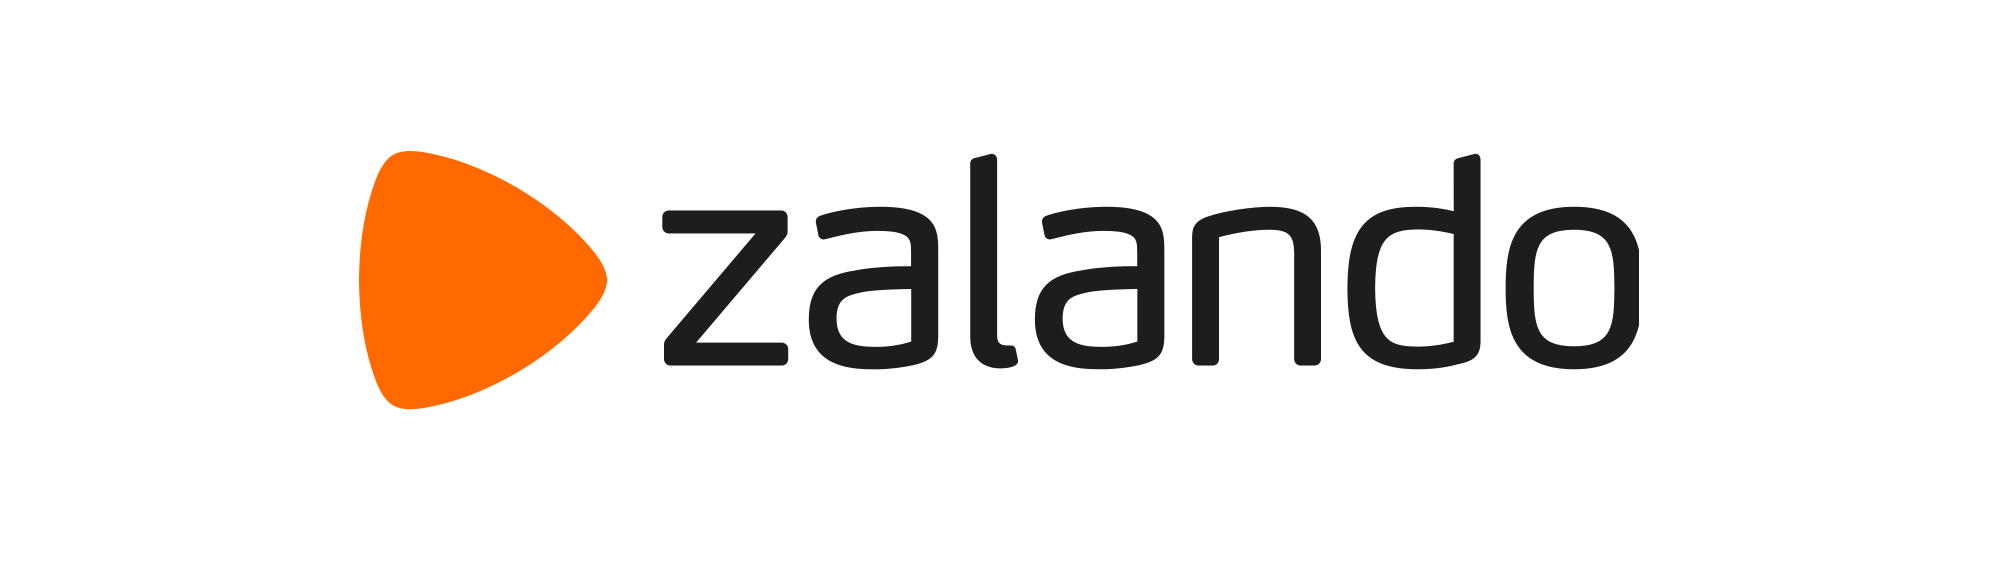 https://bombyxplm.com/wp-content/uploads/2019/05/Zalando-Logo.png